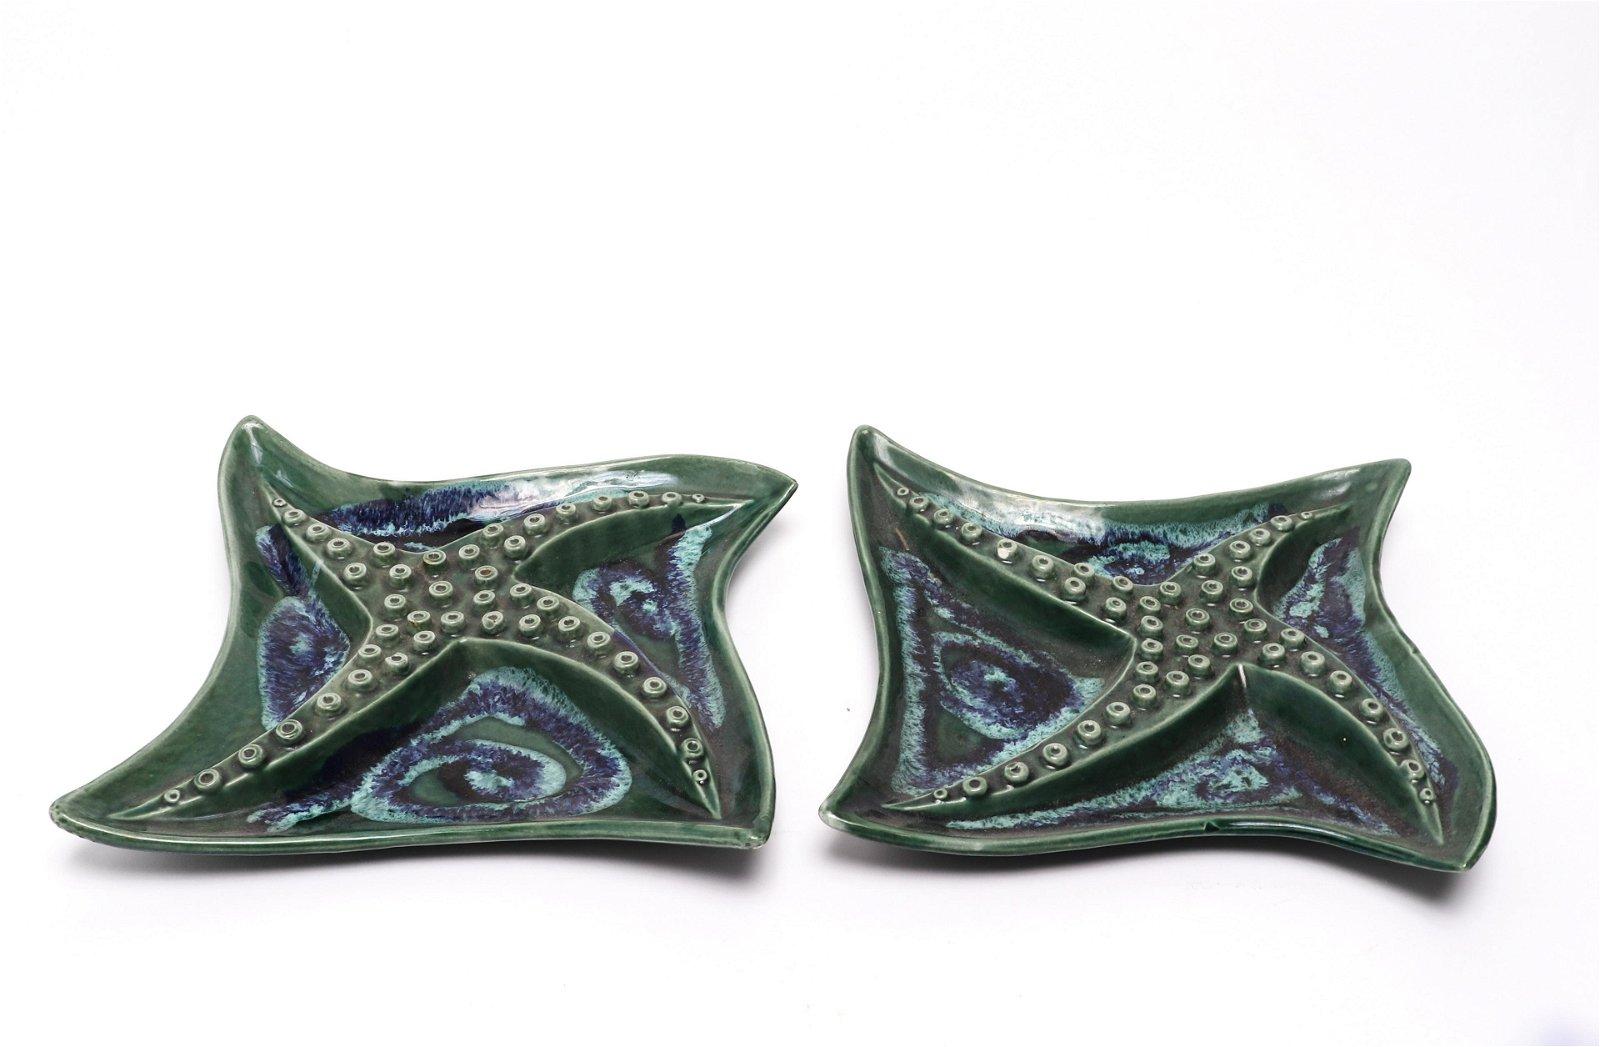 Ceramic Starfish Motif Serving Dishes, Pair